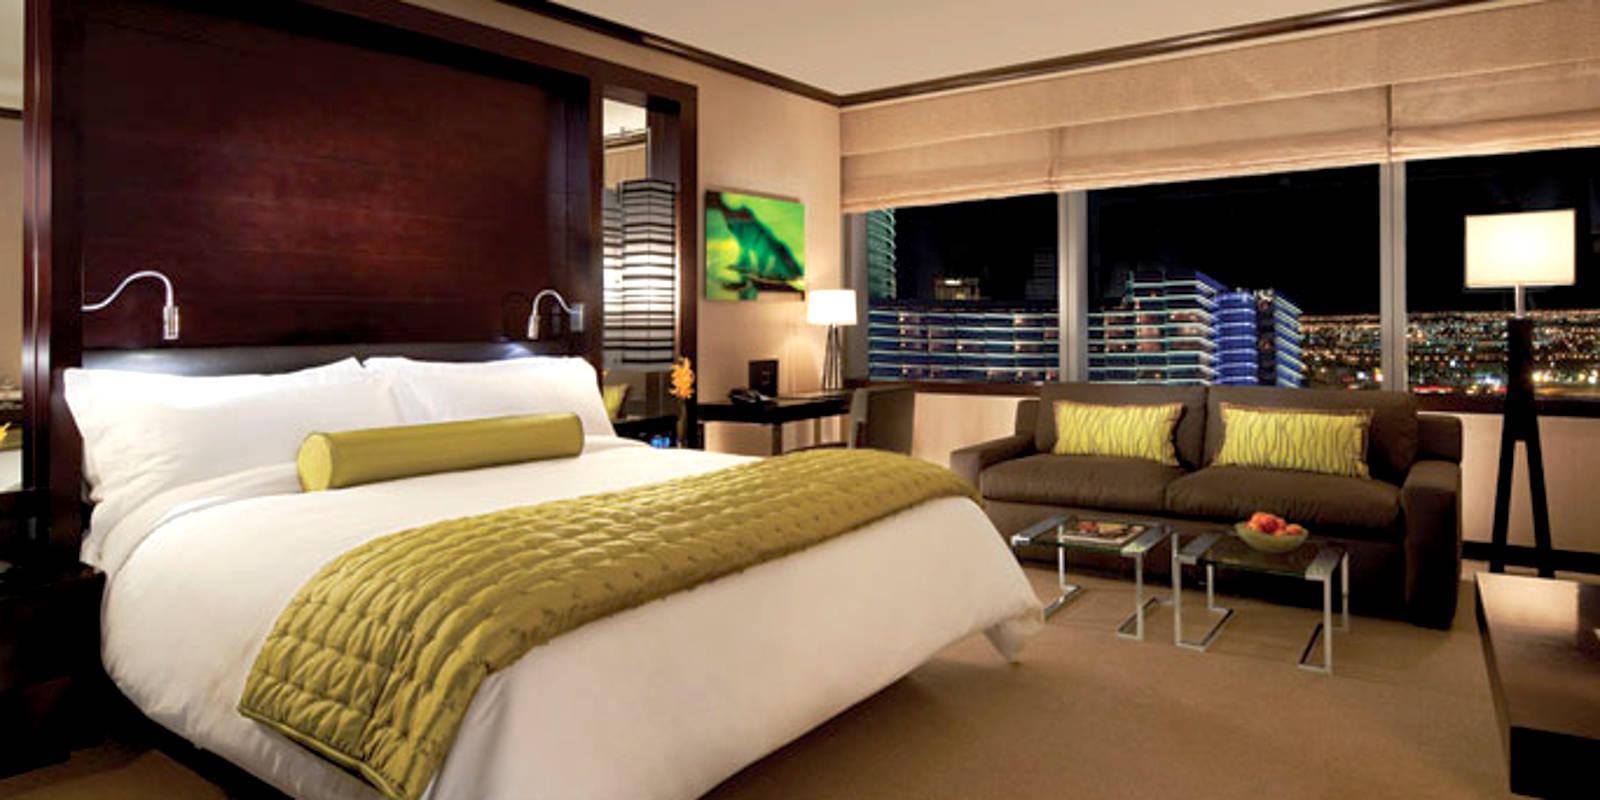 Vdara Hotel and Spa in Las Vegas, Nevada